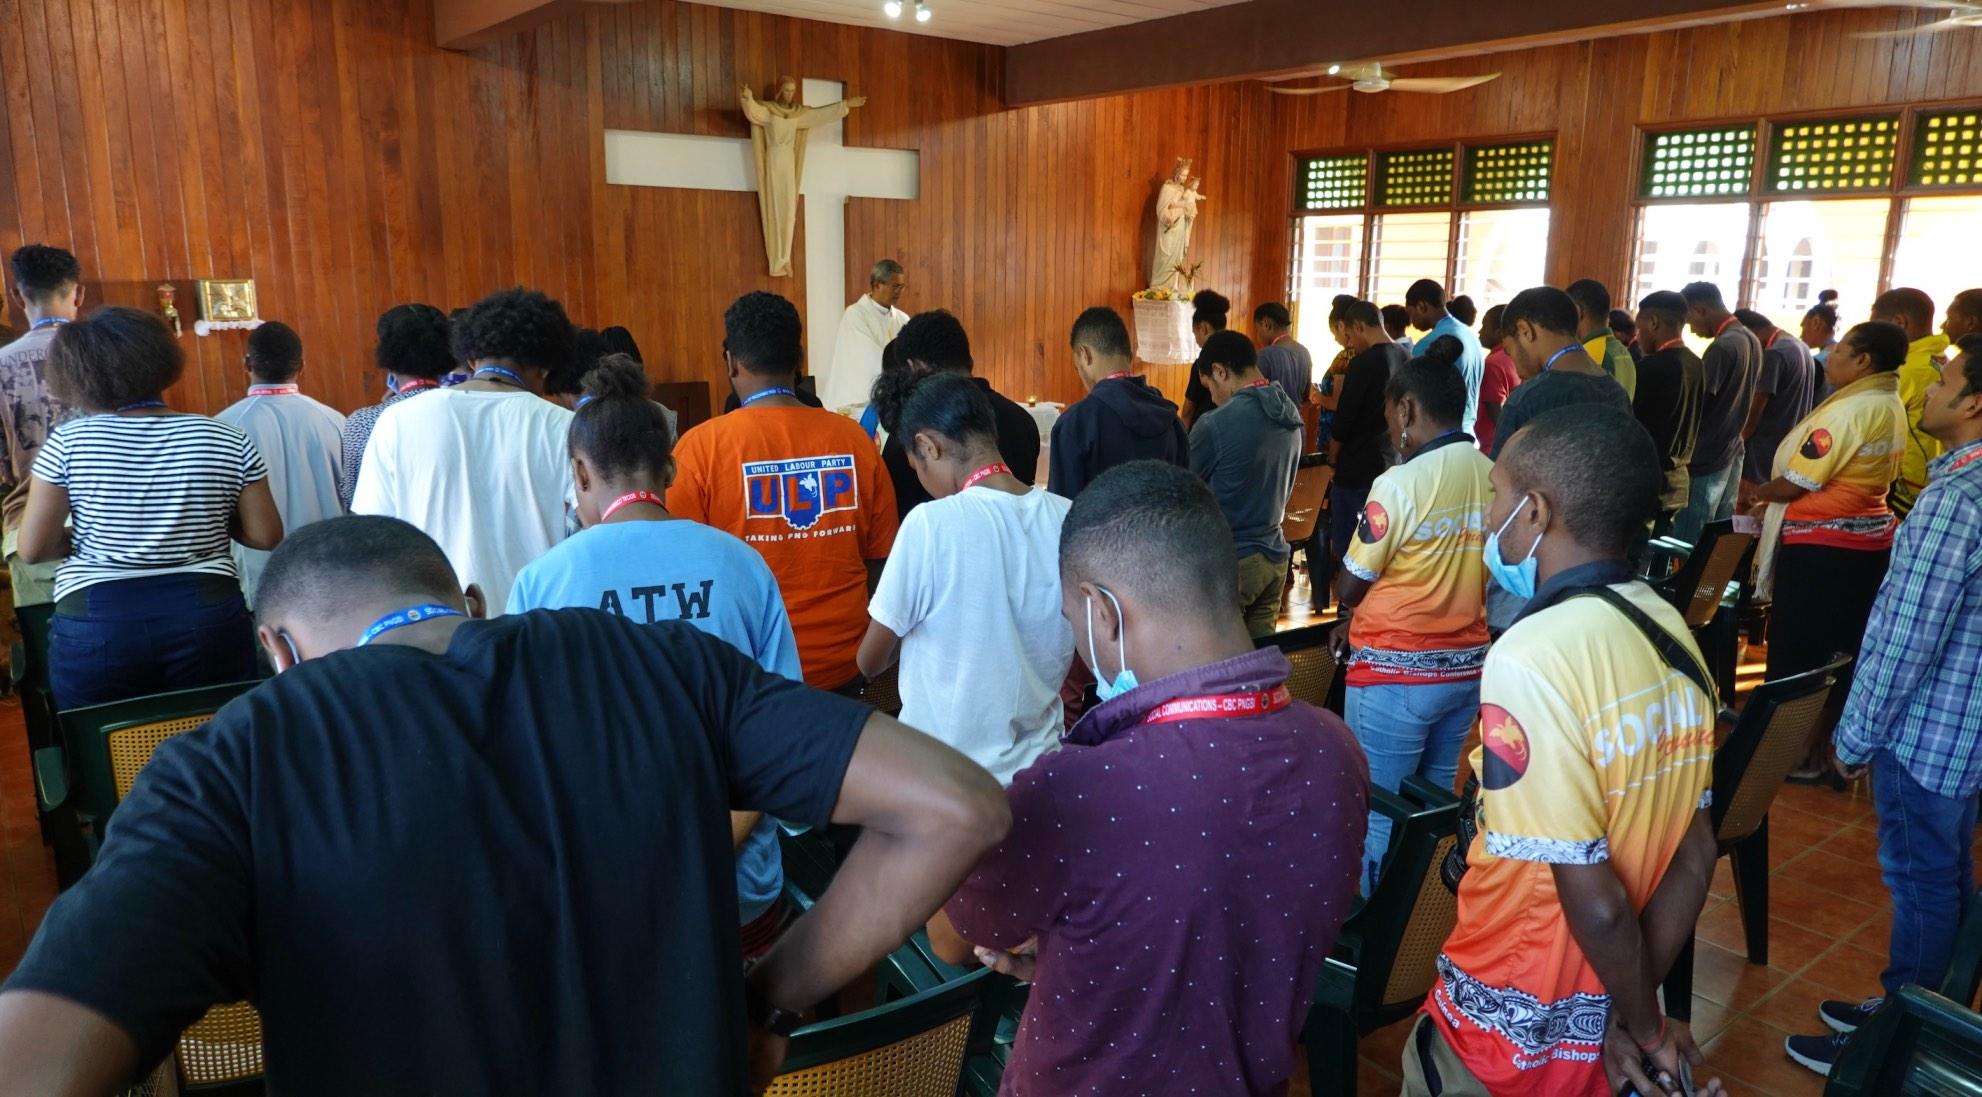 1 Mass celebration